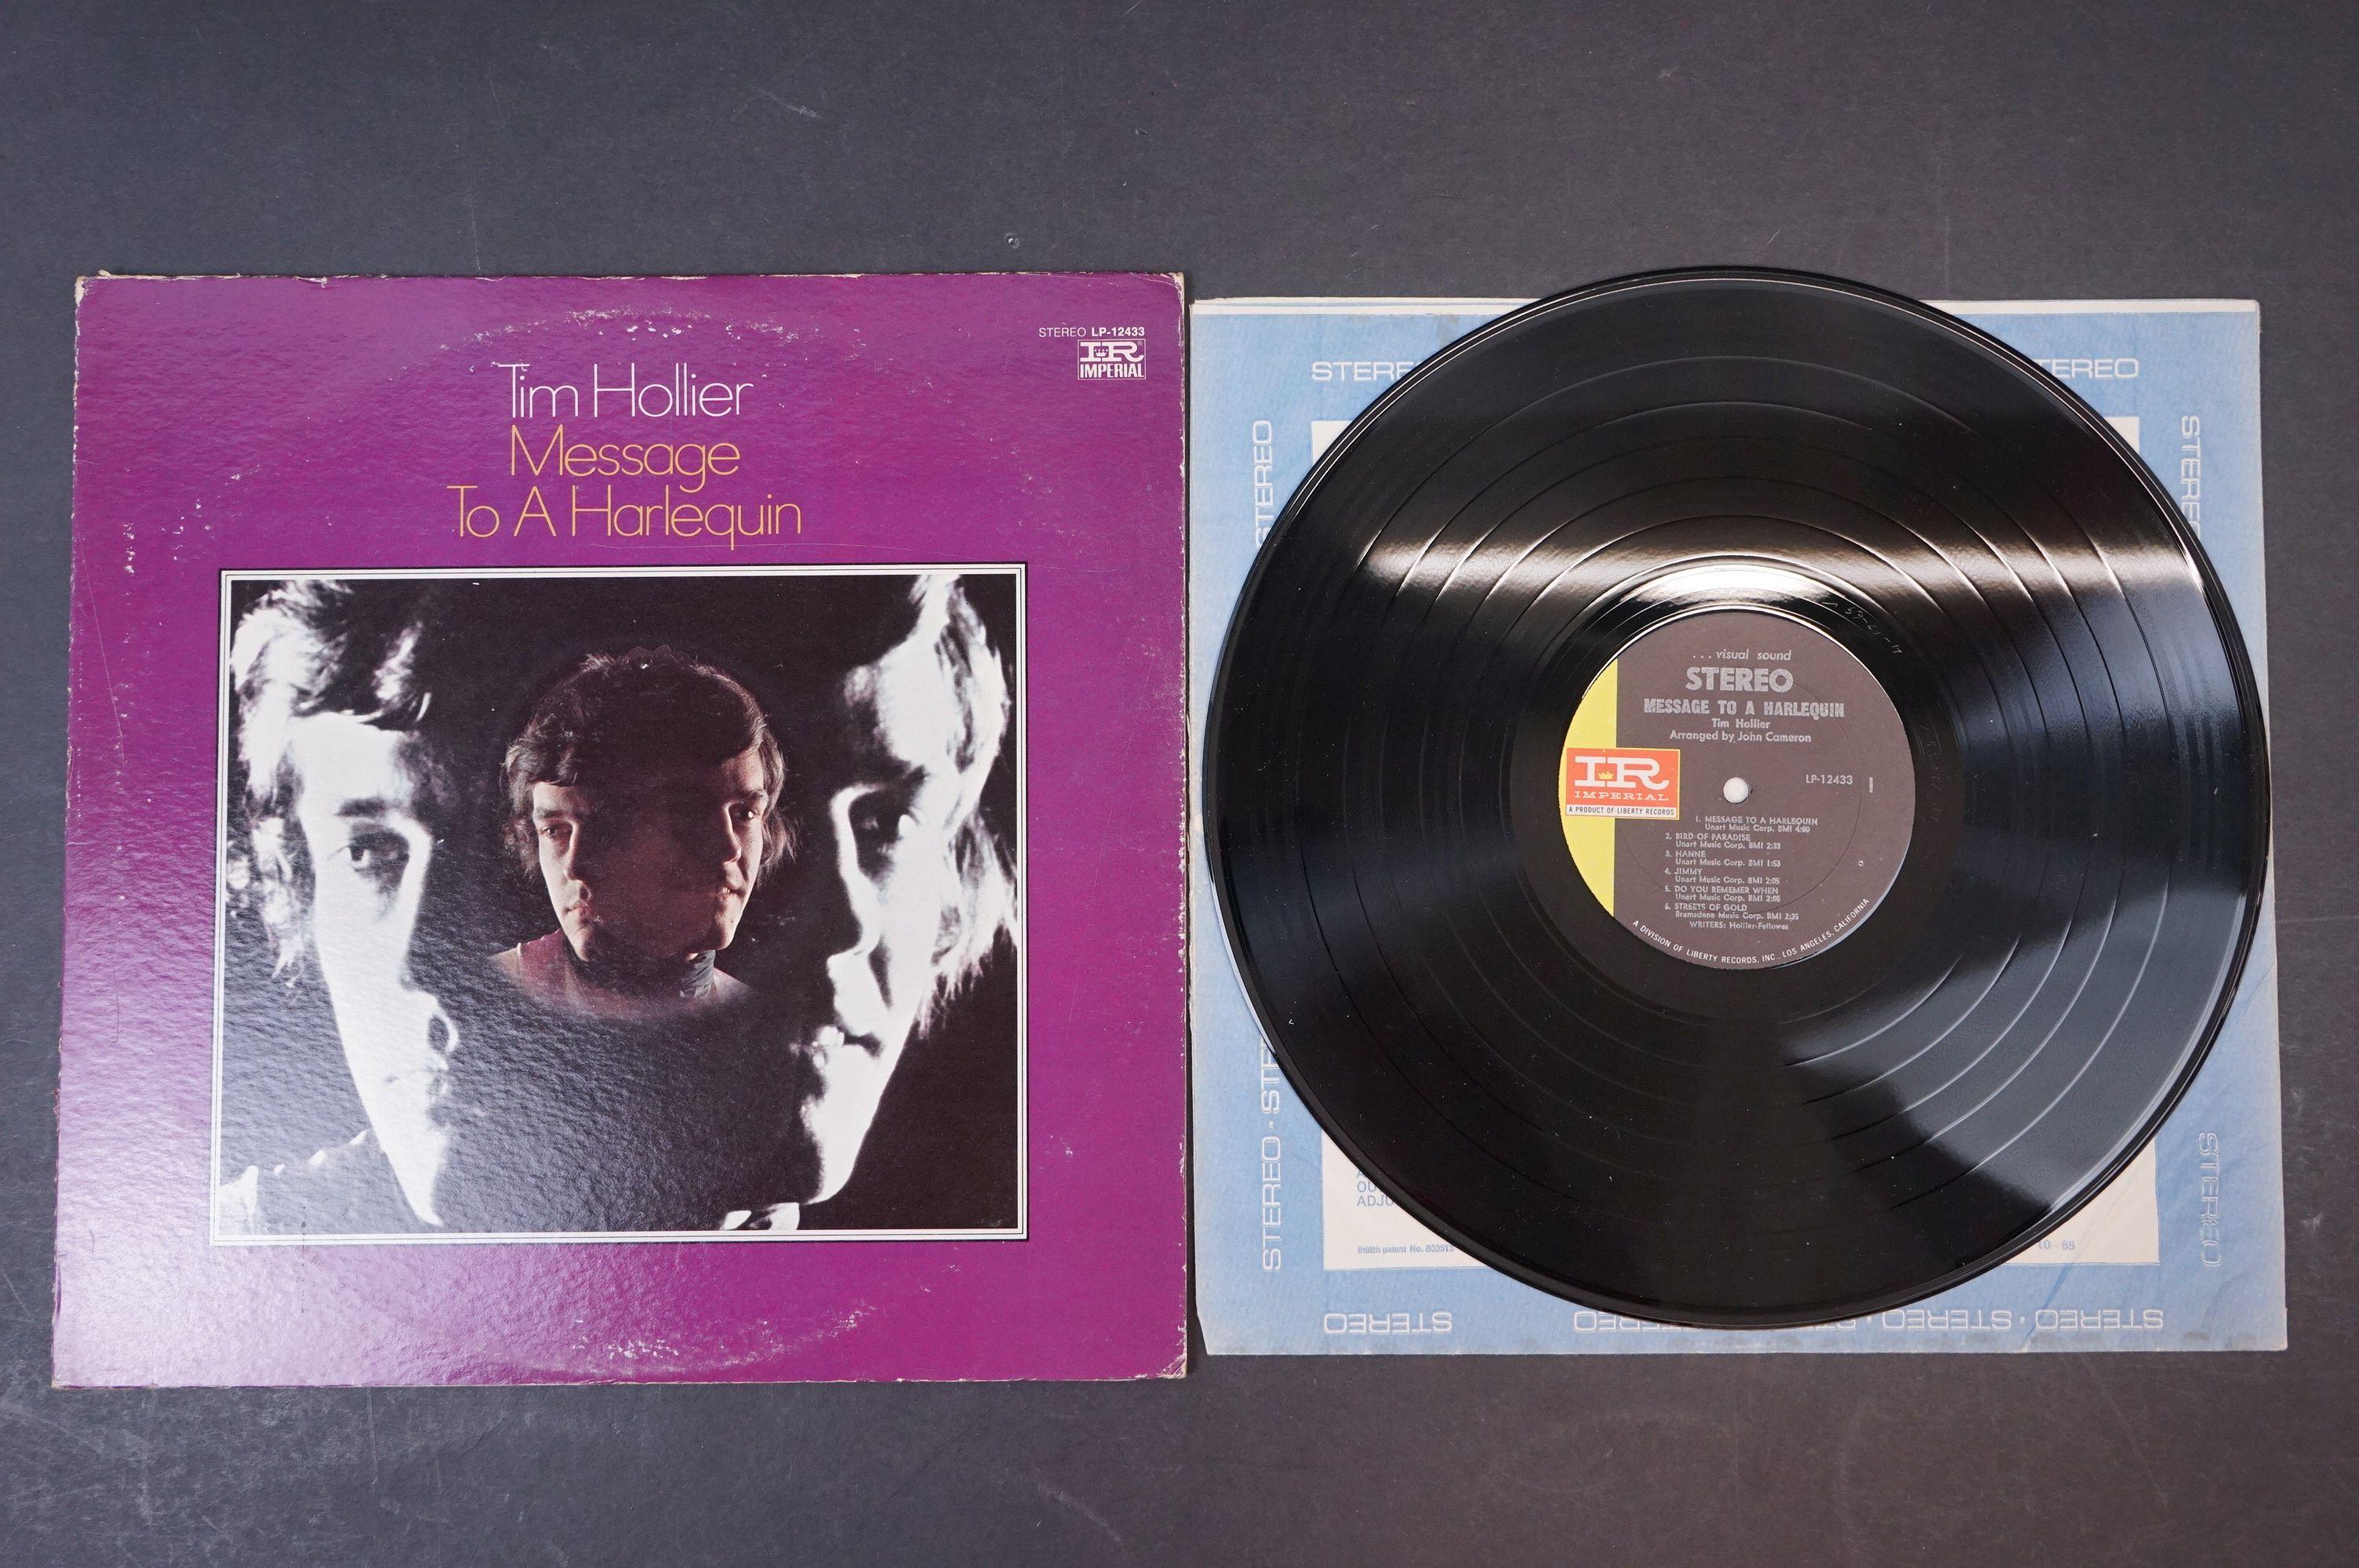 Vinyl - Acid Folk / Psych - Tim Hollier, Three scarce original pressing albums to include ?? - Image 6 of 7